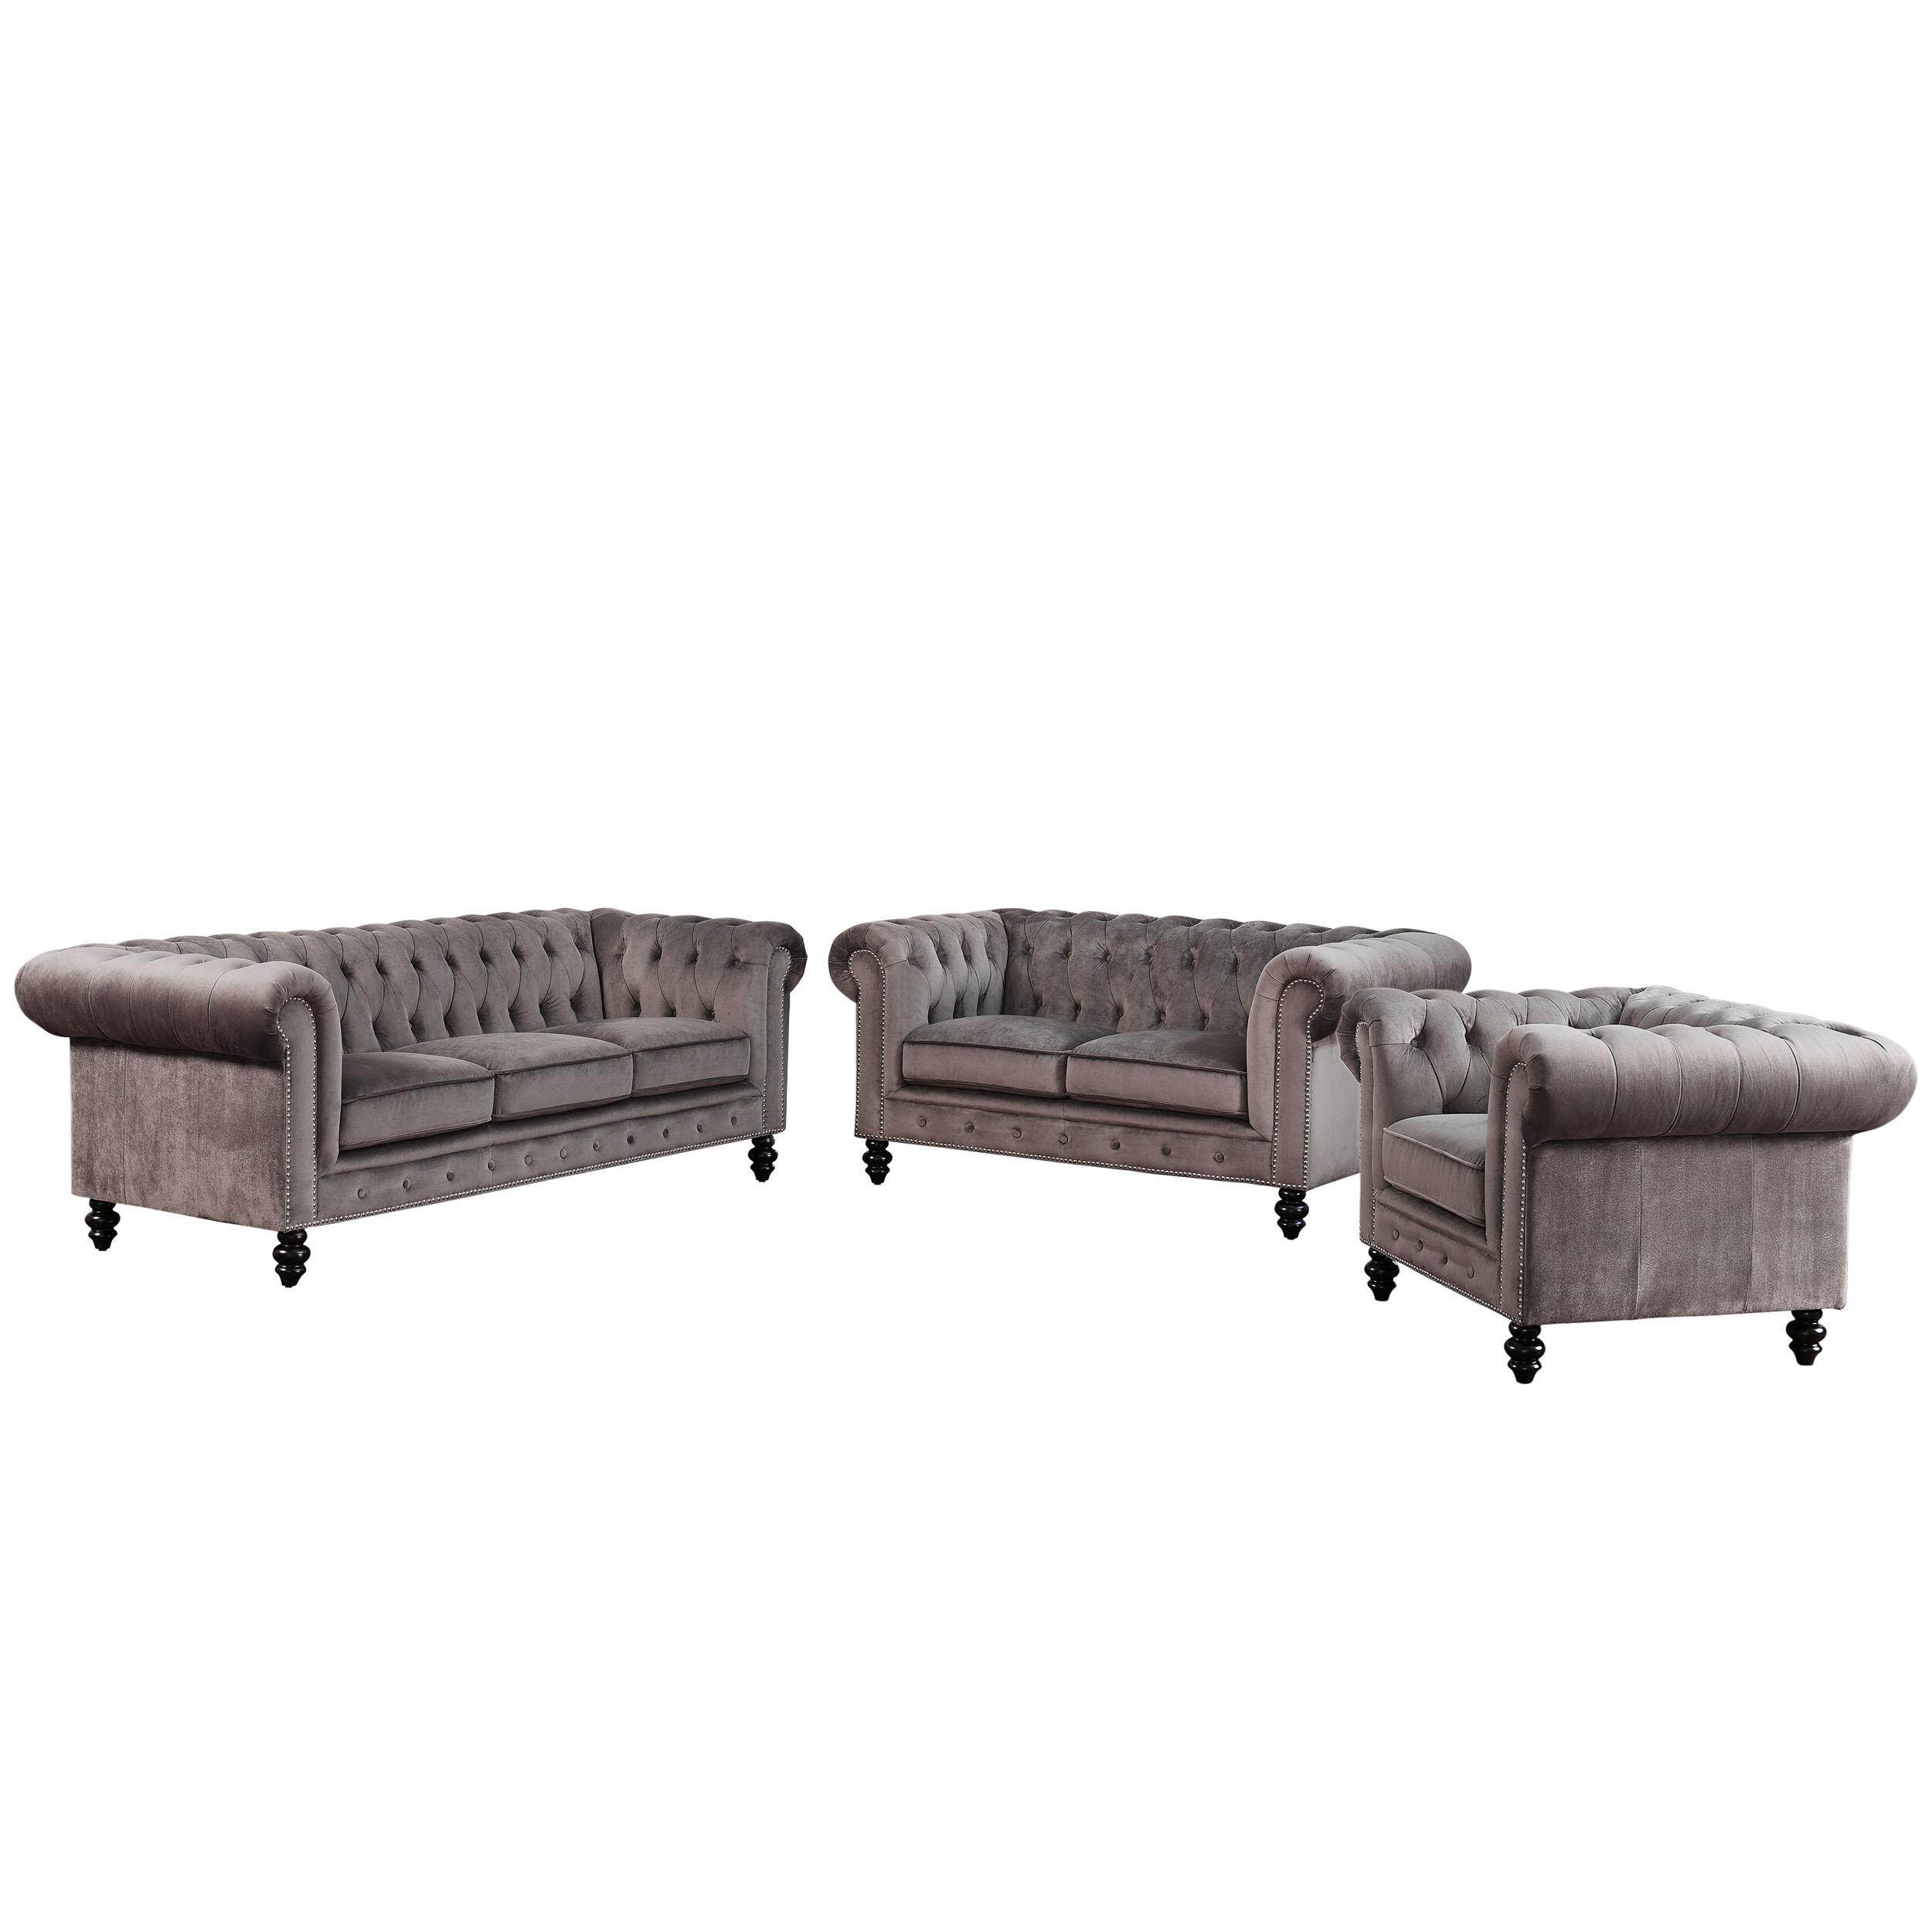 Mistana Brooklyn 3 Piece Leather Living Room Set Reviews Wayfair